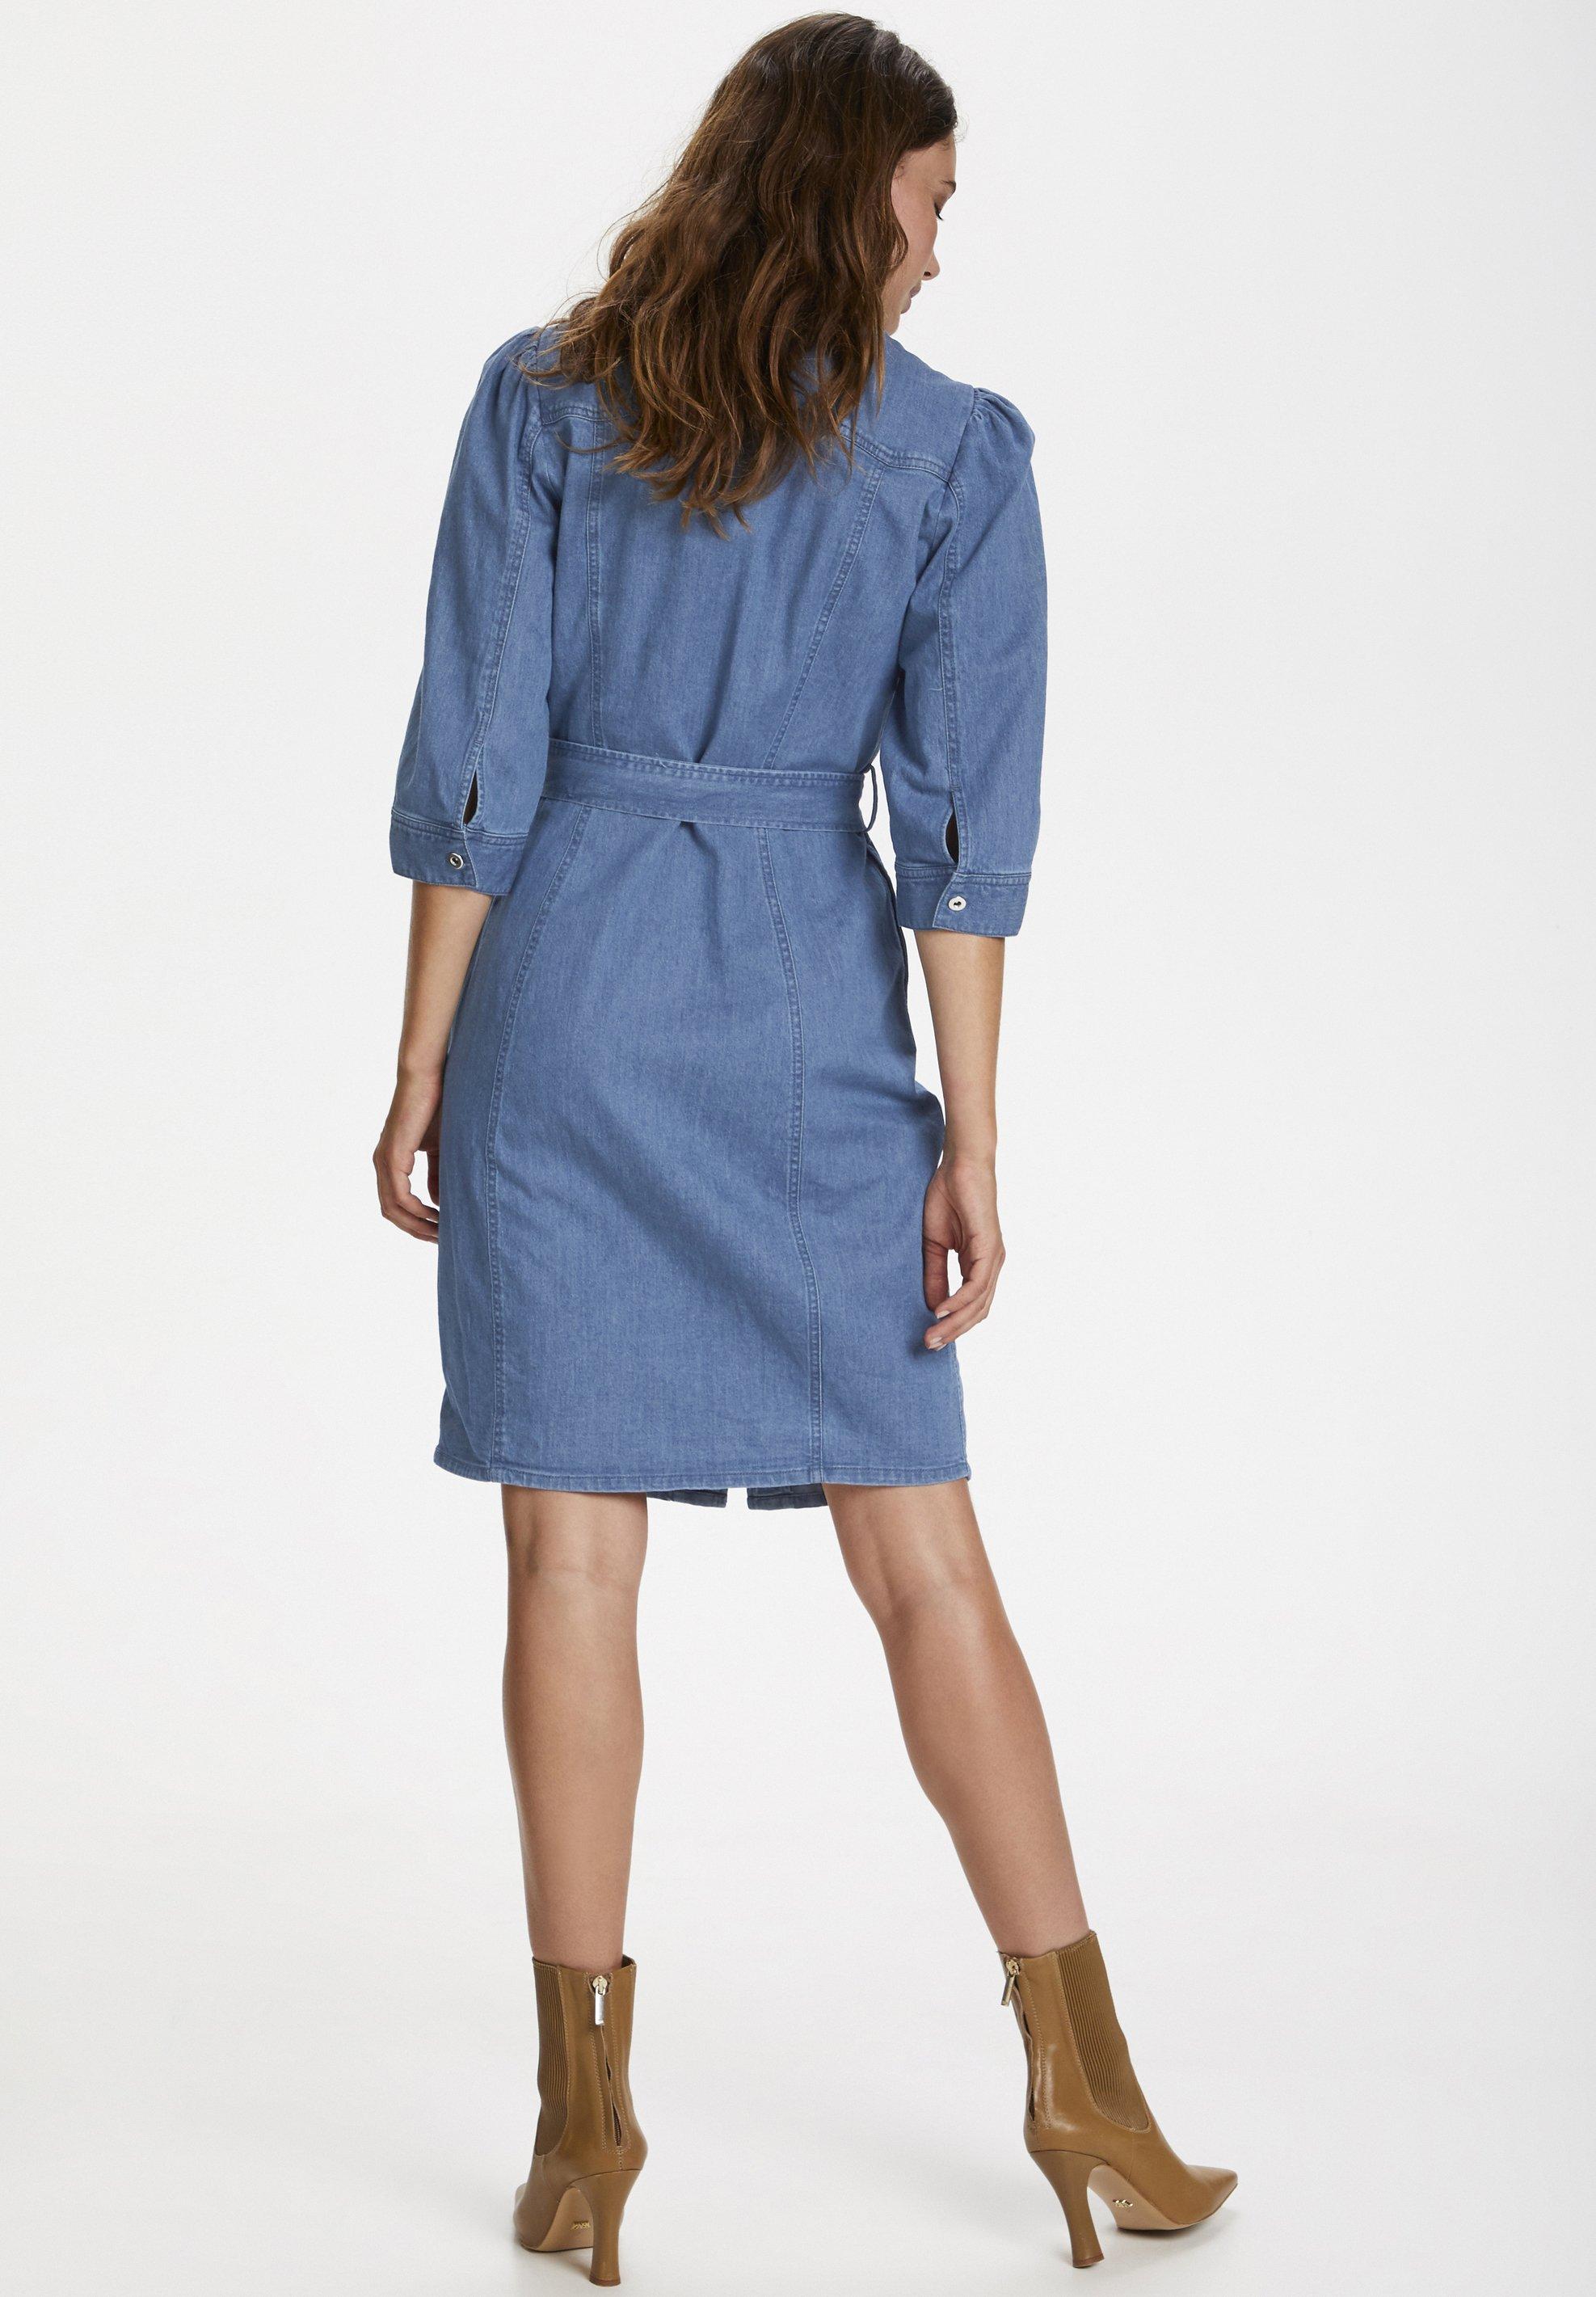 Best Authentic Fashion Style Women's Clothing Soaked in Luxury SLTINATIN Denim dress classic blue denim uZuK9i0HT m0yLGCOrA